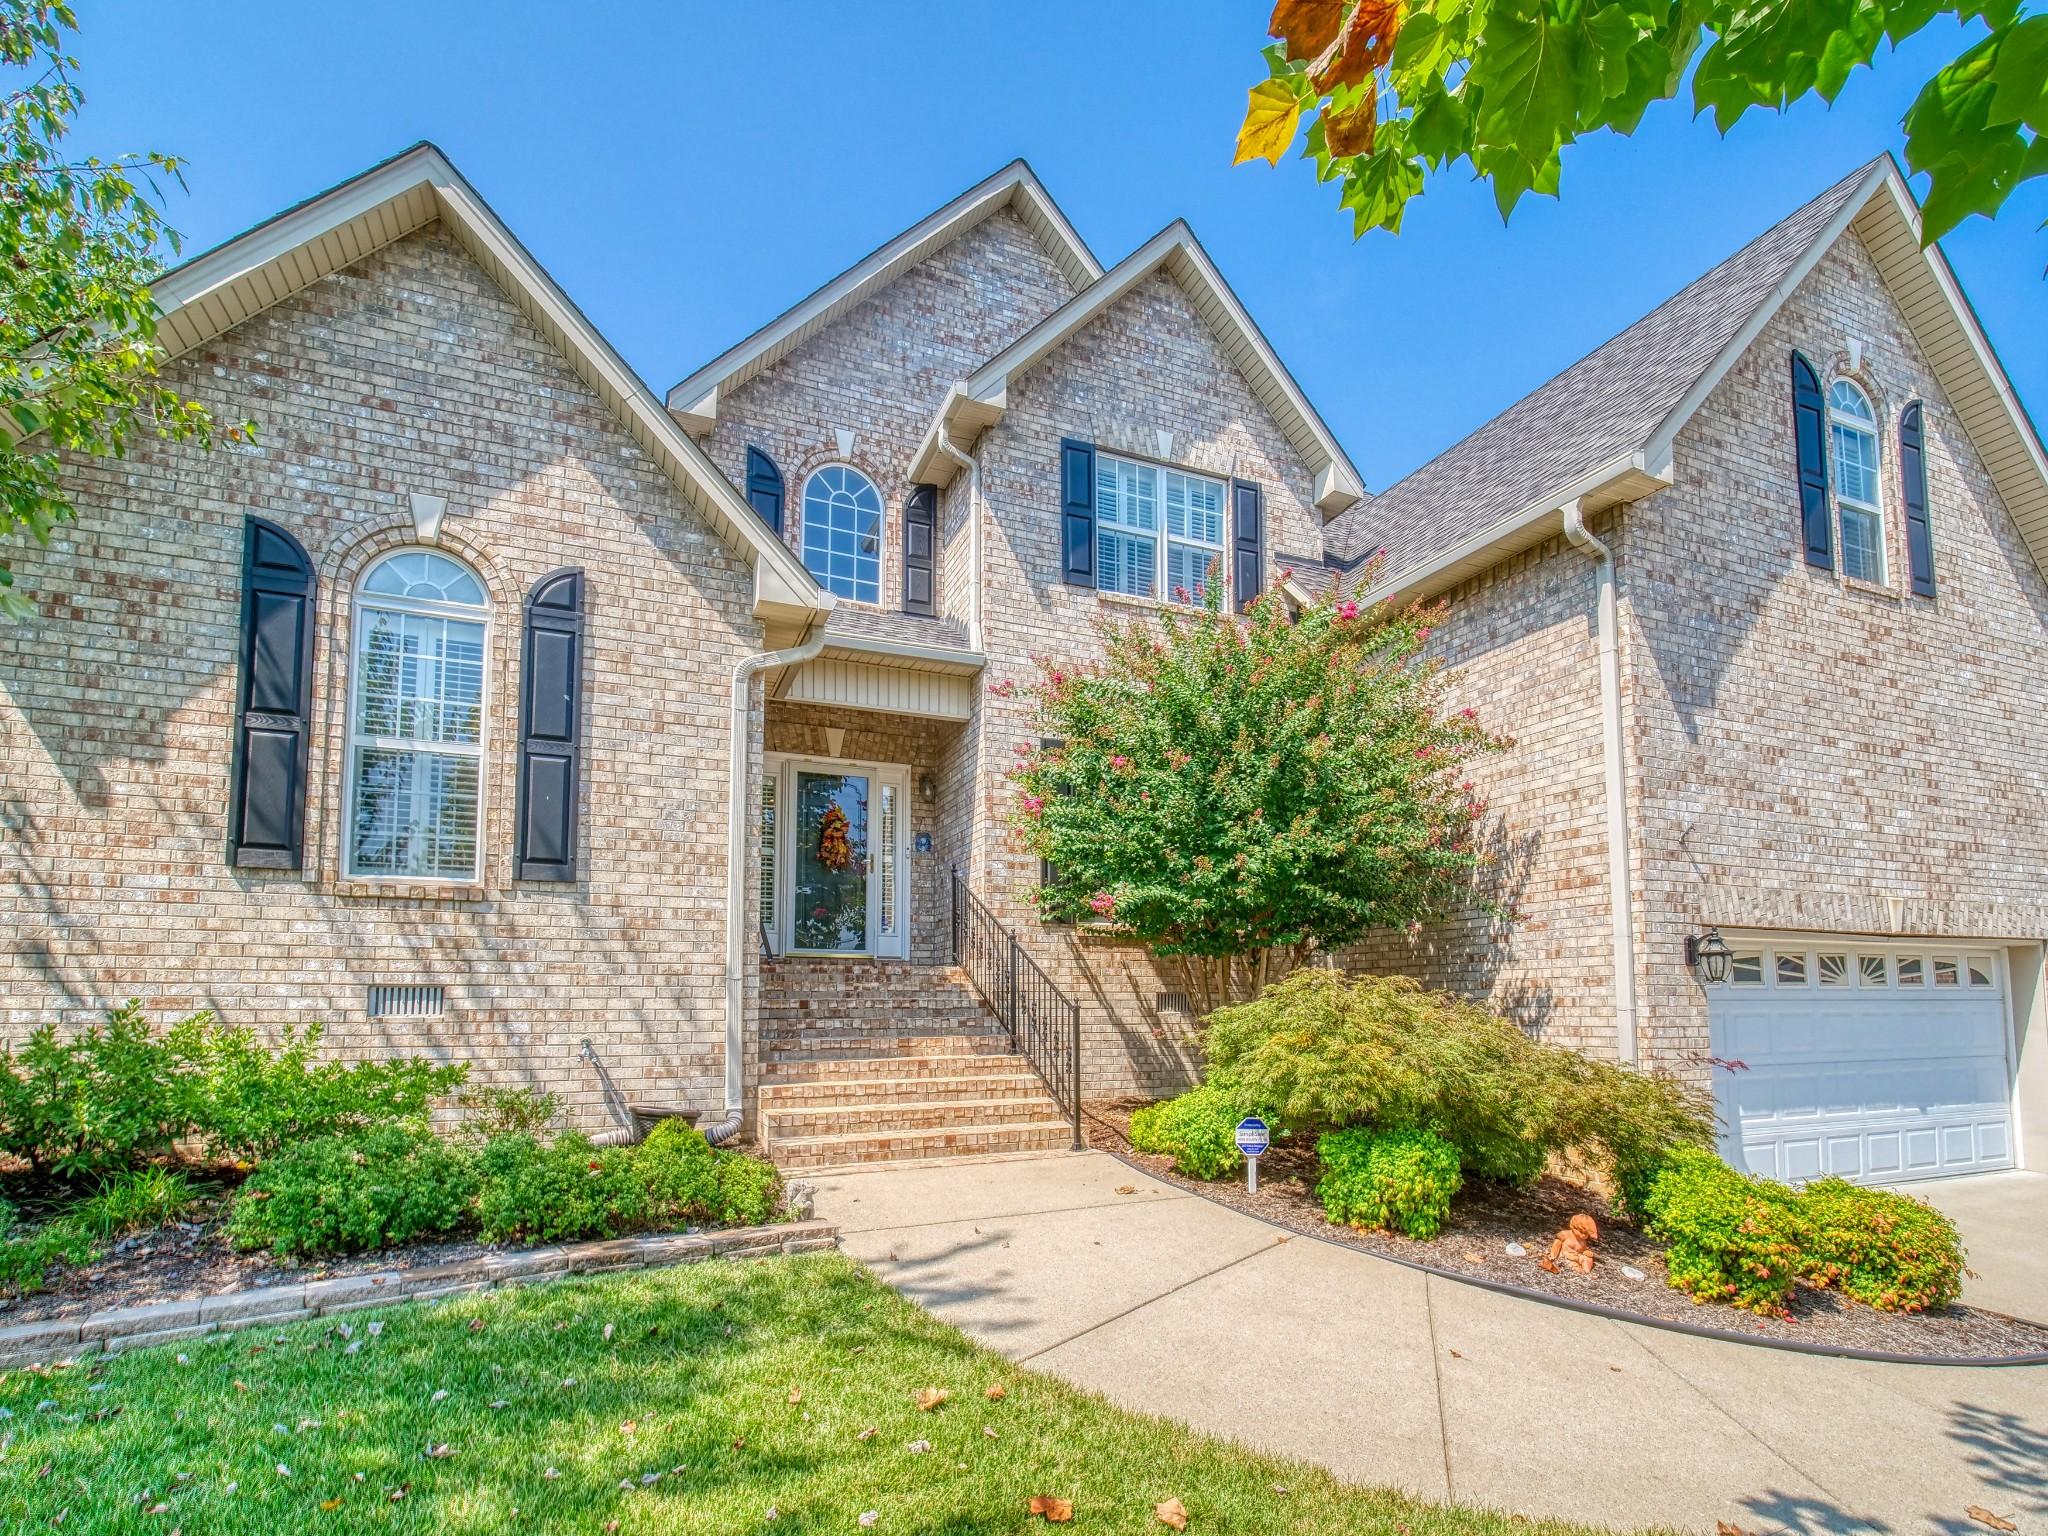 5119 Reagan Dr, Murfreesboro, TN 37129 - Murfreesboro, TN real estate listing